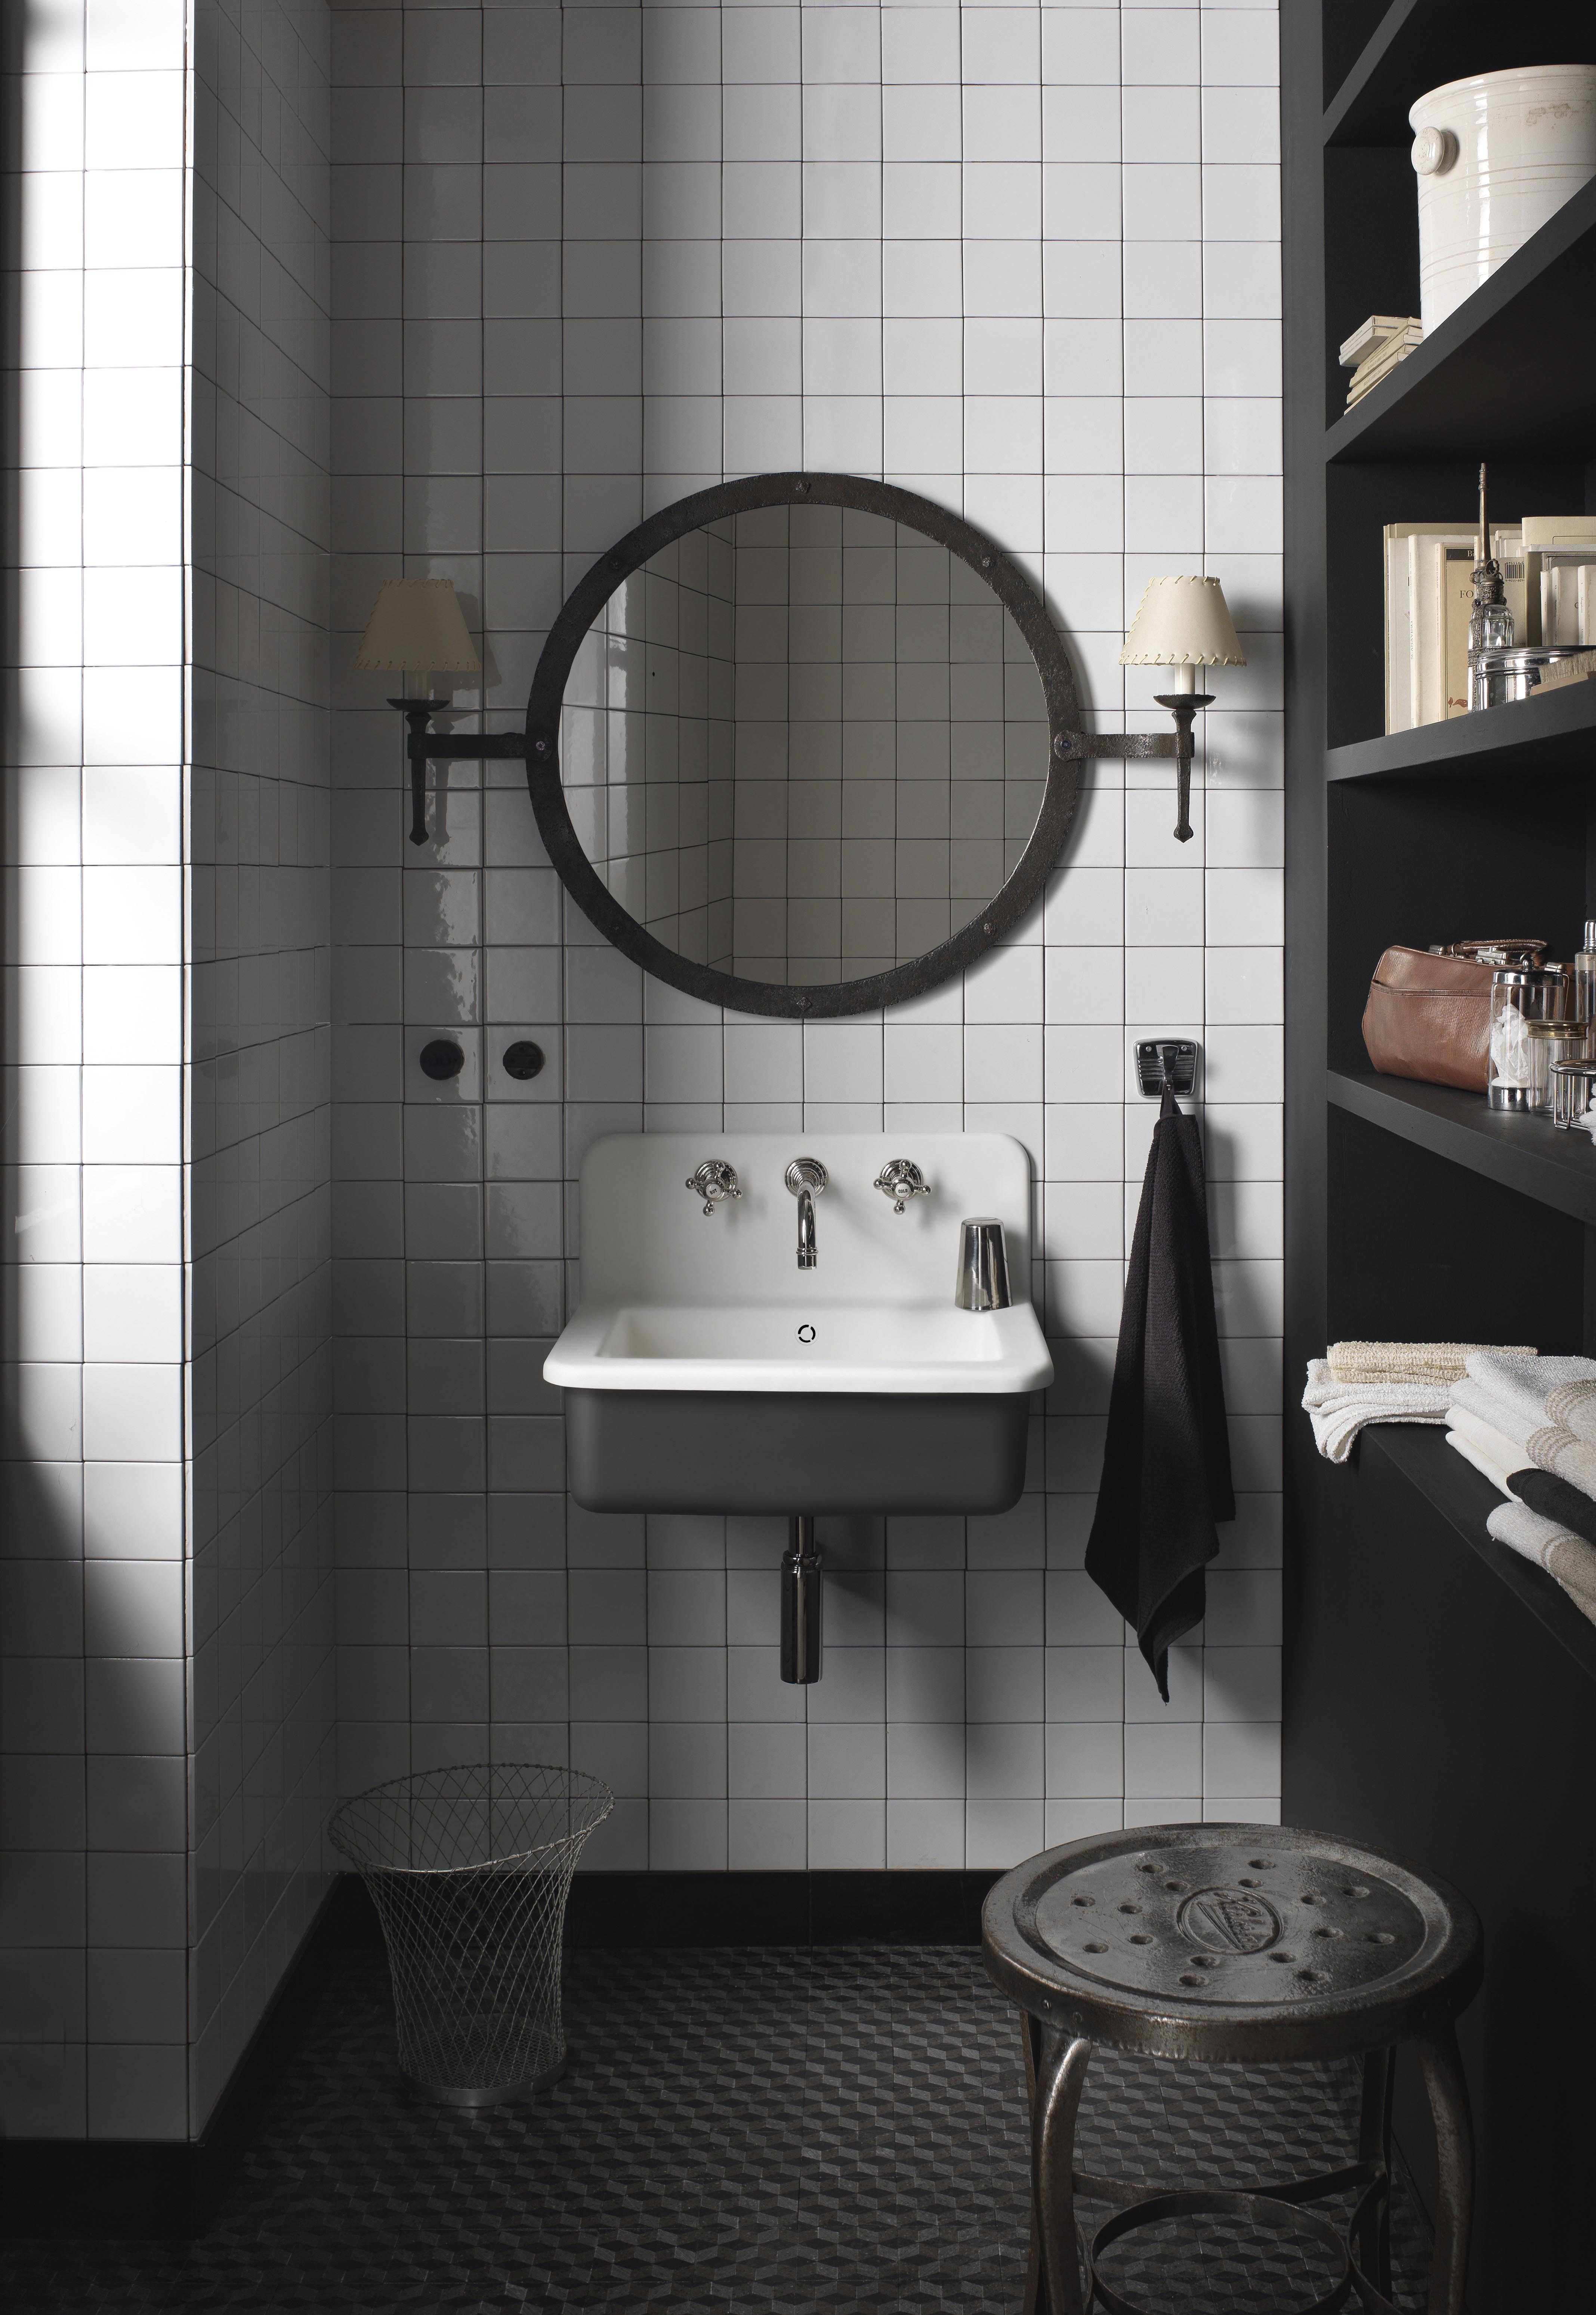 corian® per i lavabi da bagno - dupont™ corian® solid surfaces ... - Arredo Bagno Corian